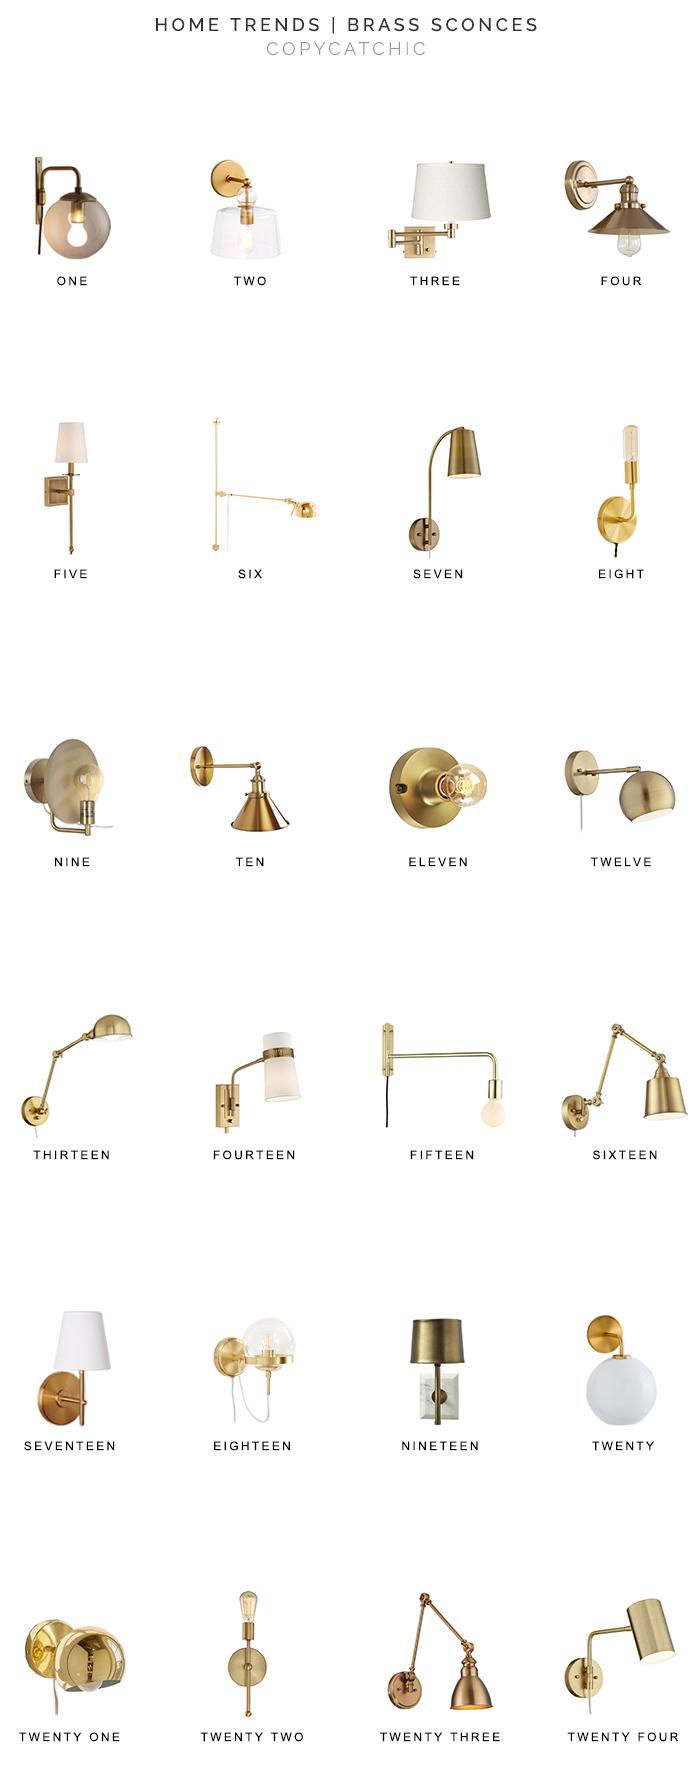 Home Trends | Brass Sconces – copycatchic